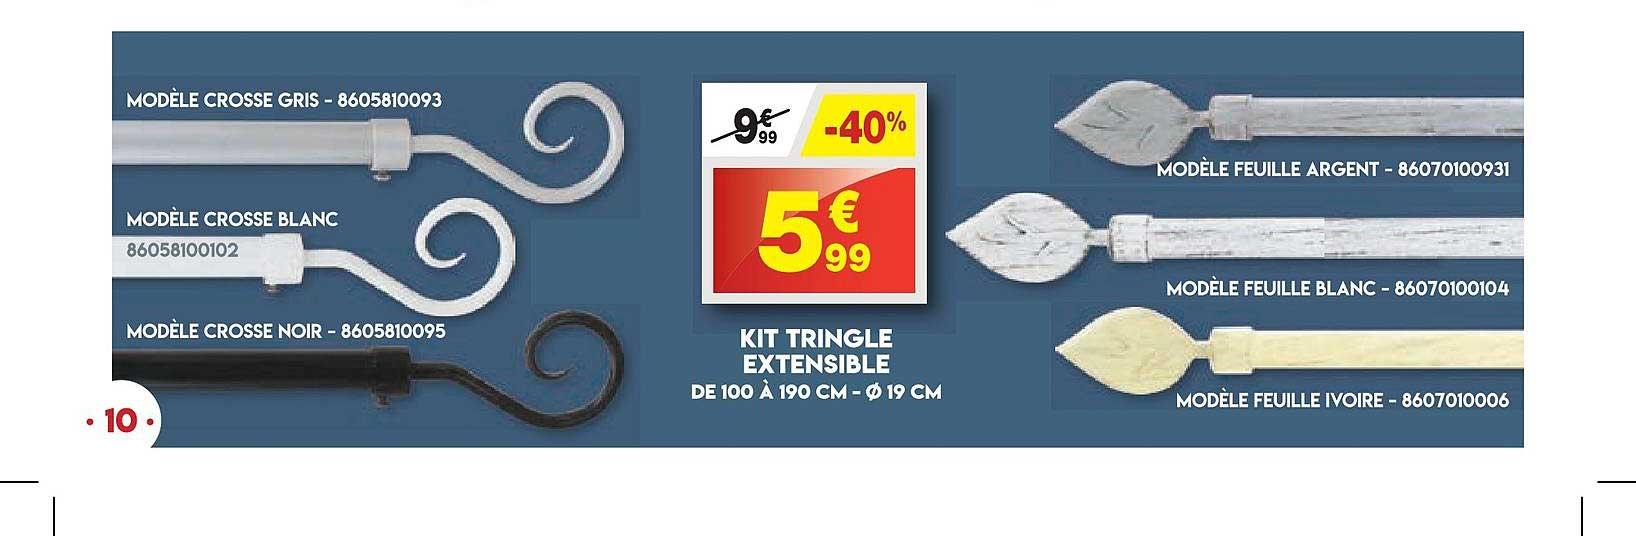 Maxi Bazar Kit De Tringle Extensible